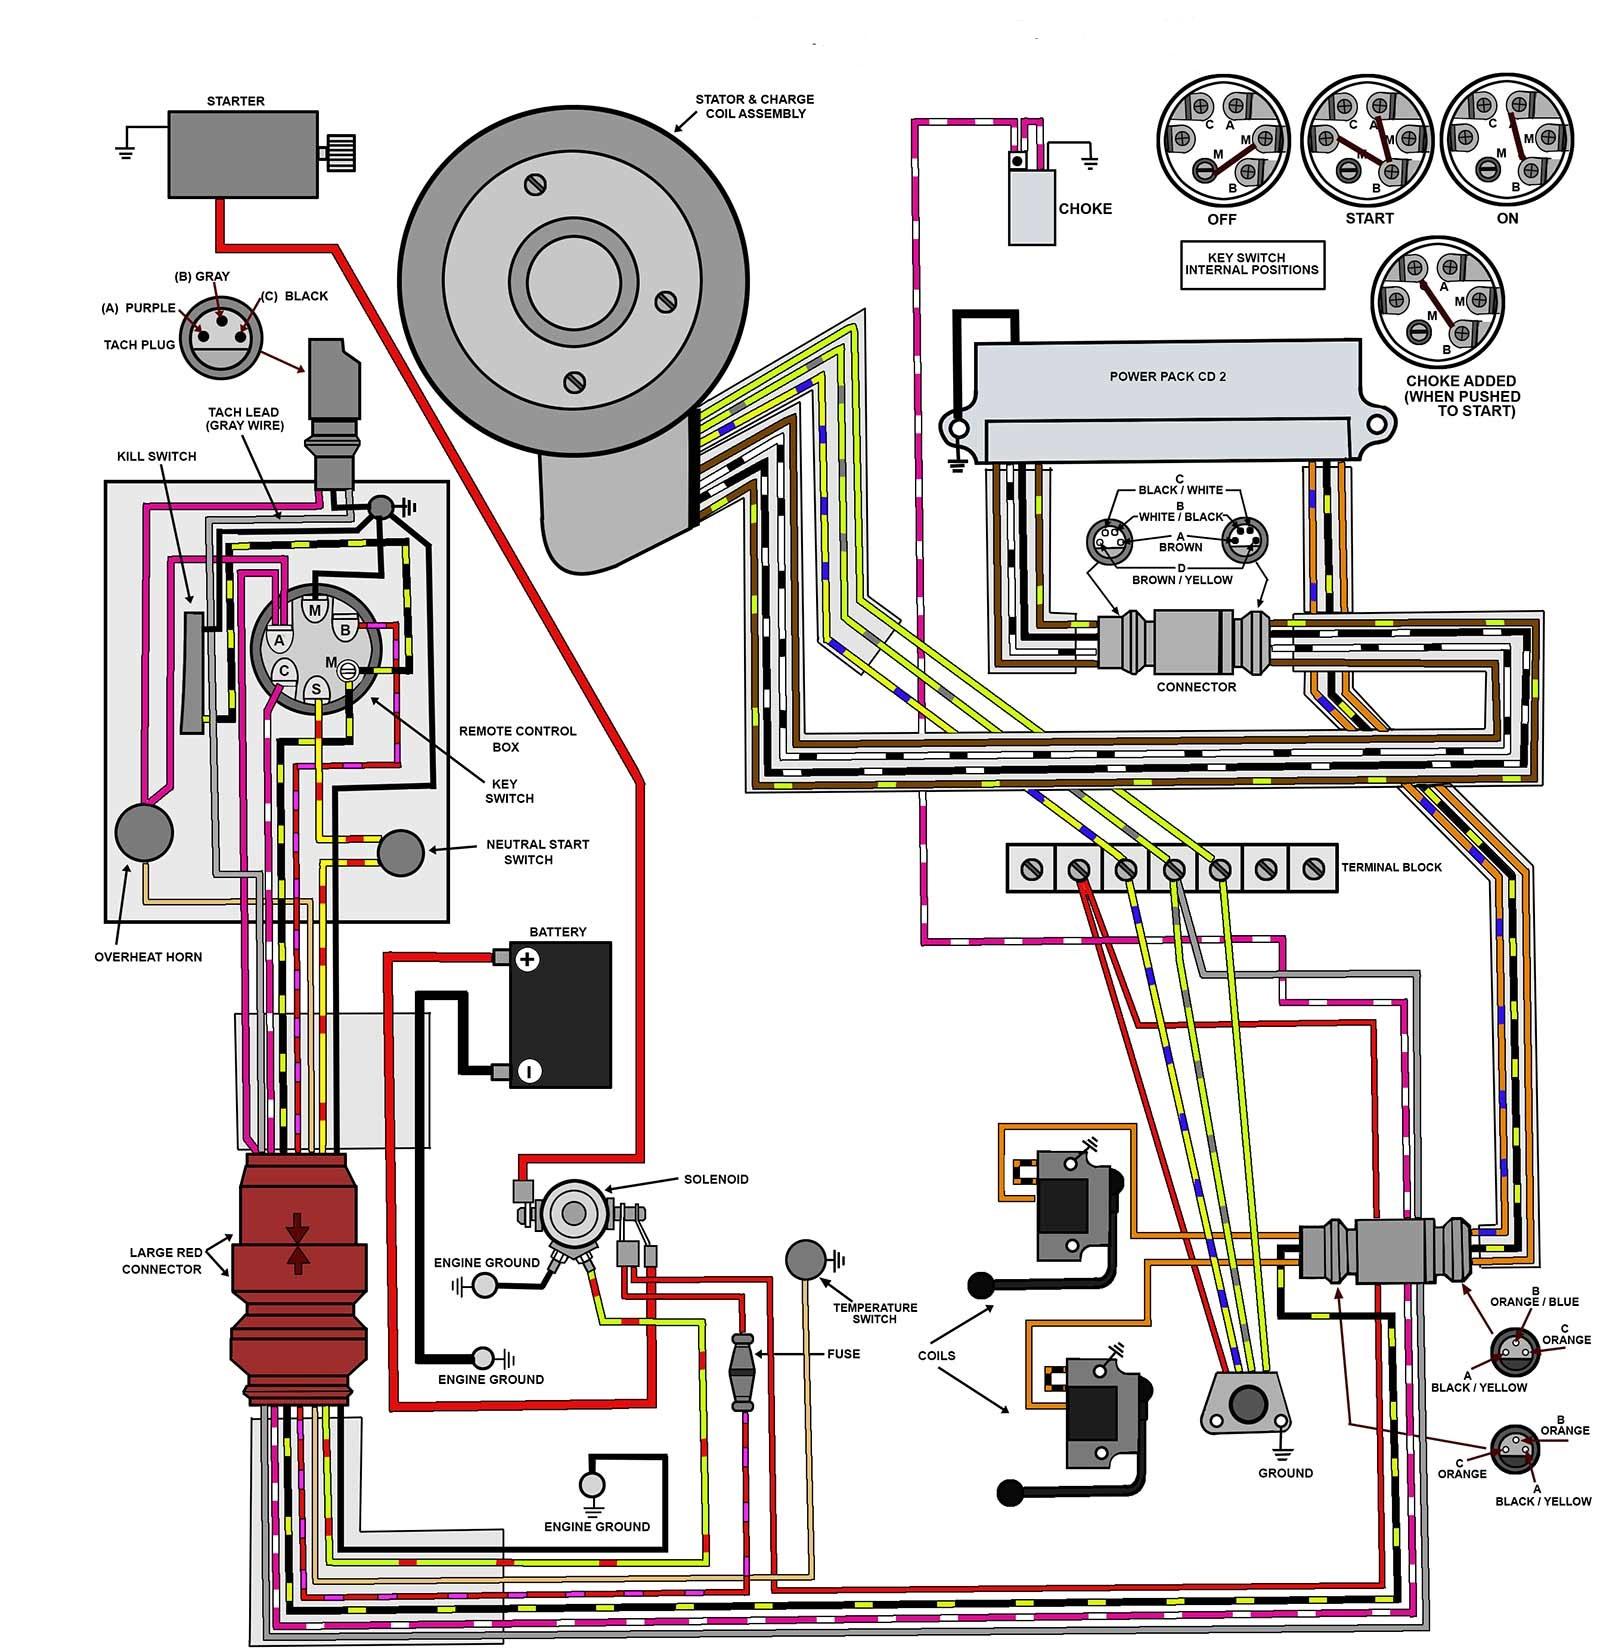 82bde2b7-ecf9-4cdc-8583-d53bf8ca01df_25_35_82-83_elec-remote.jpg